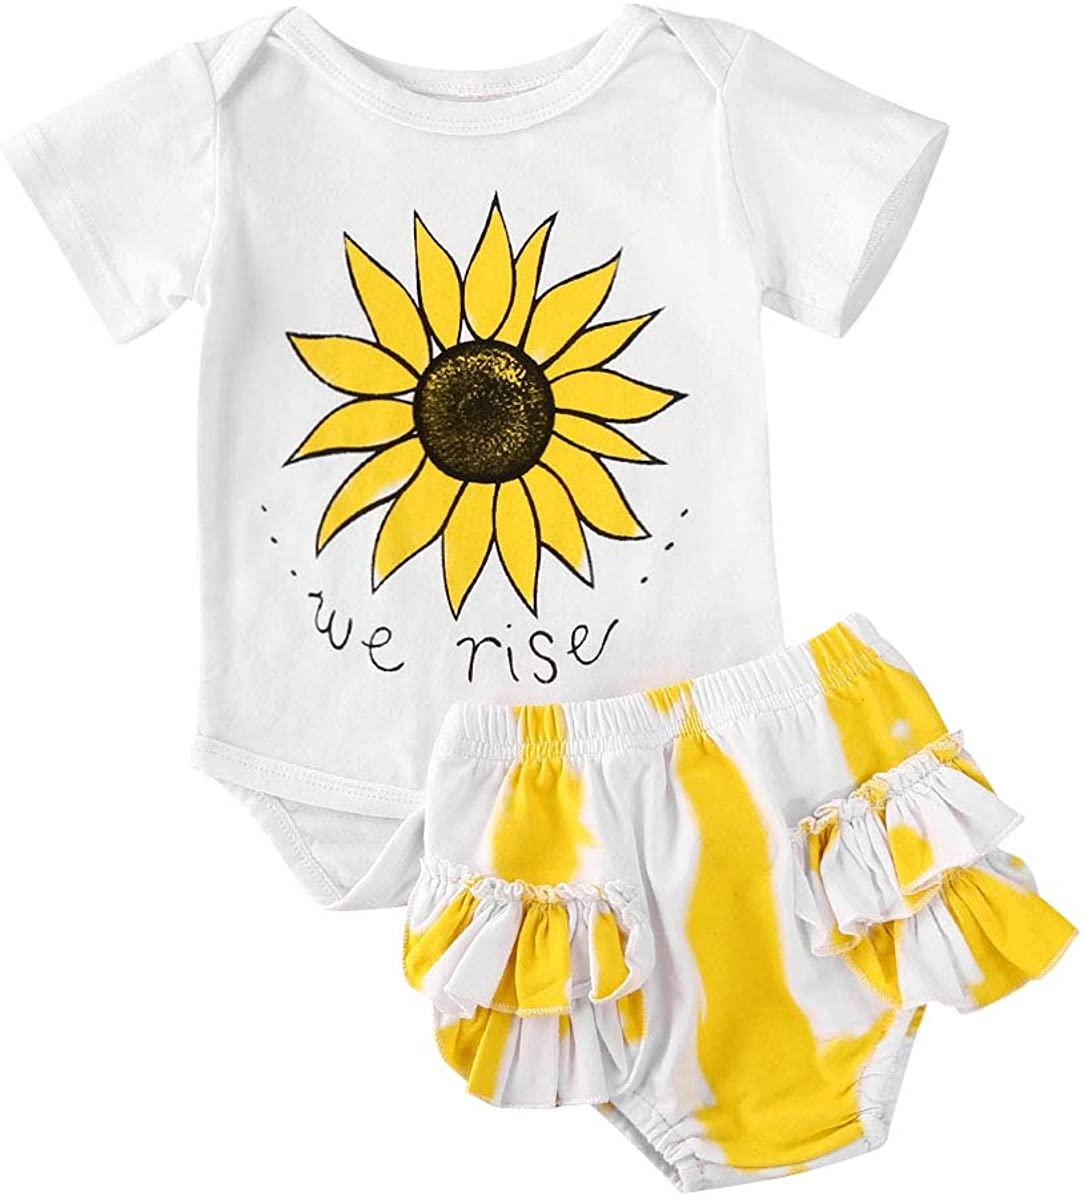 Newborn Infant Baby Girls Sunflower Romper Jumpsuit Lace Lotus Leaf Shorts Dress Summer Outfits 2pcs